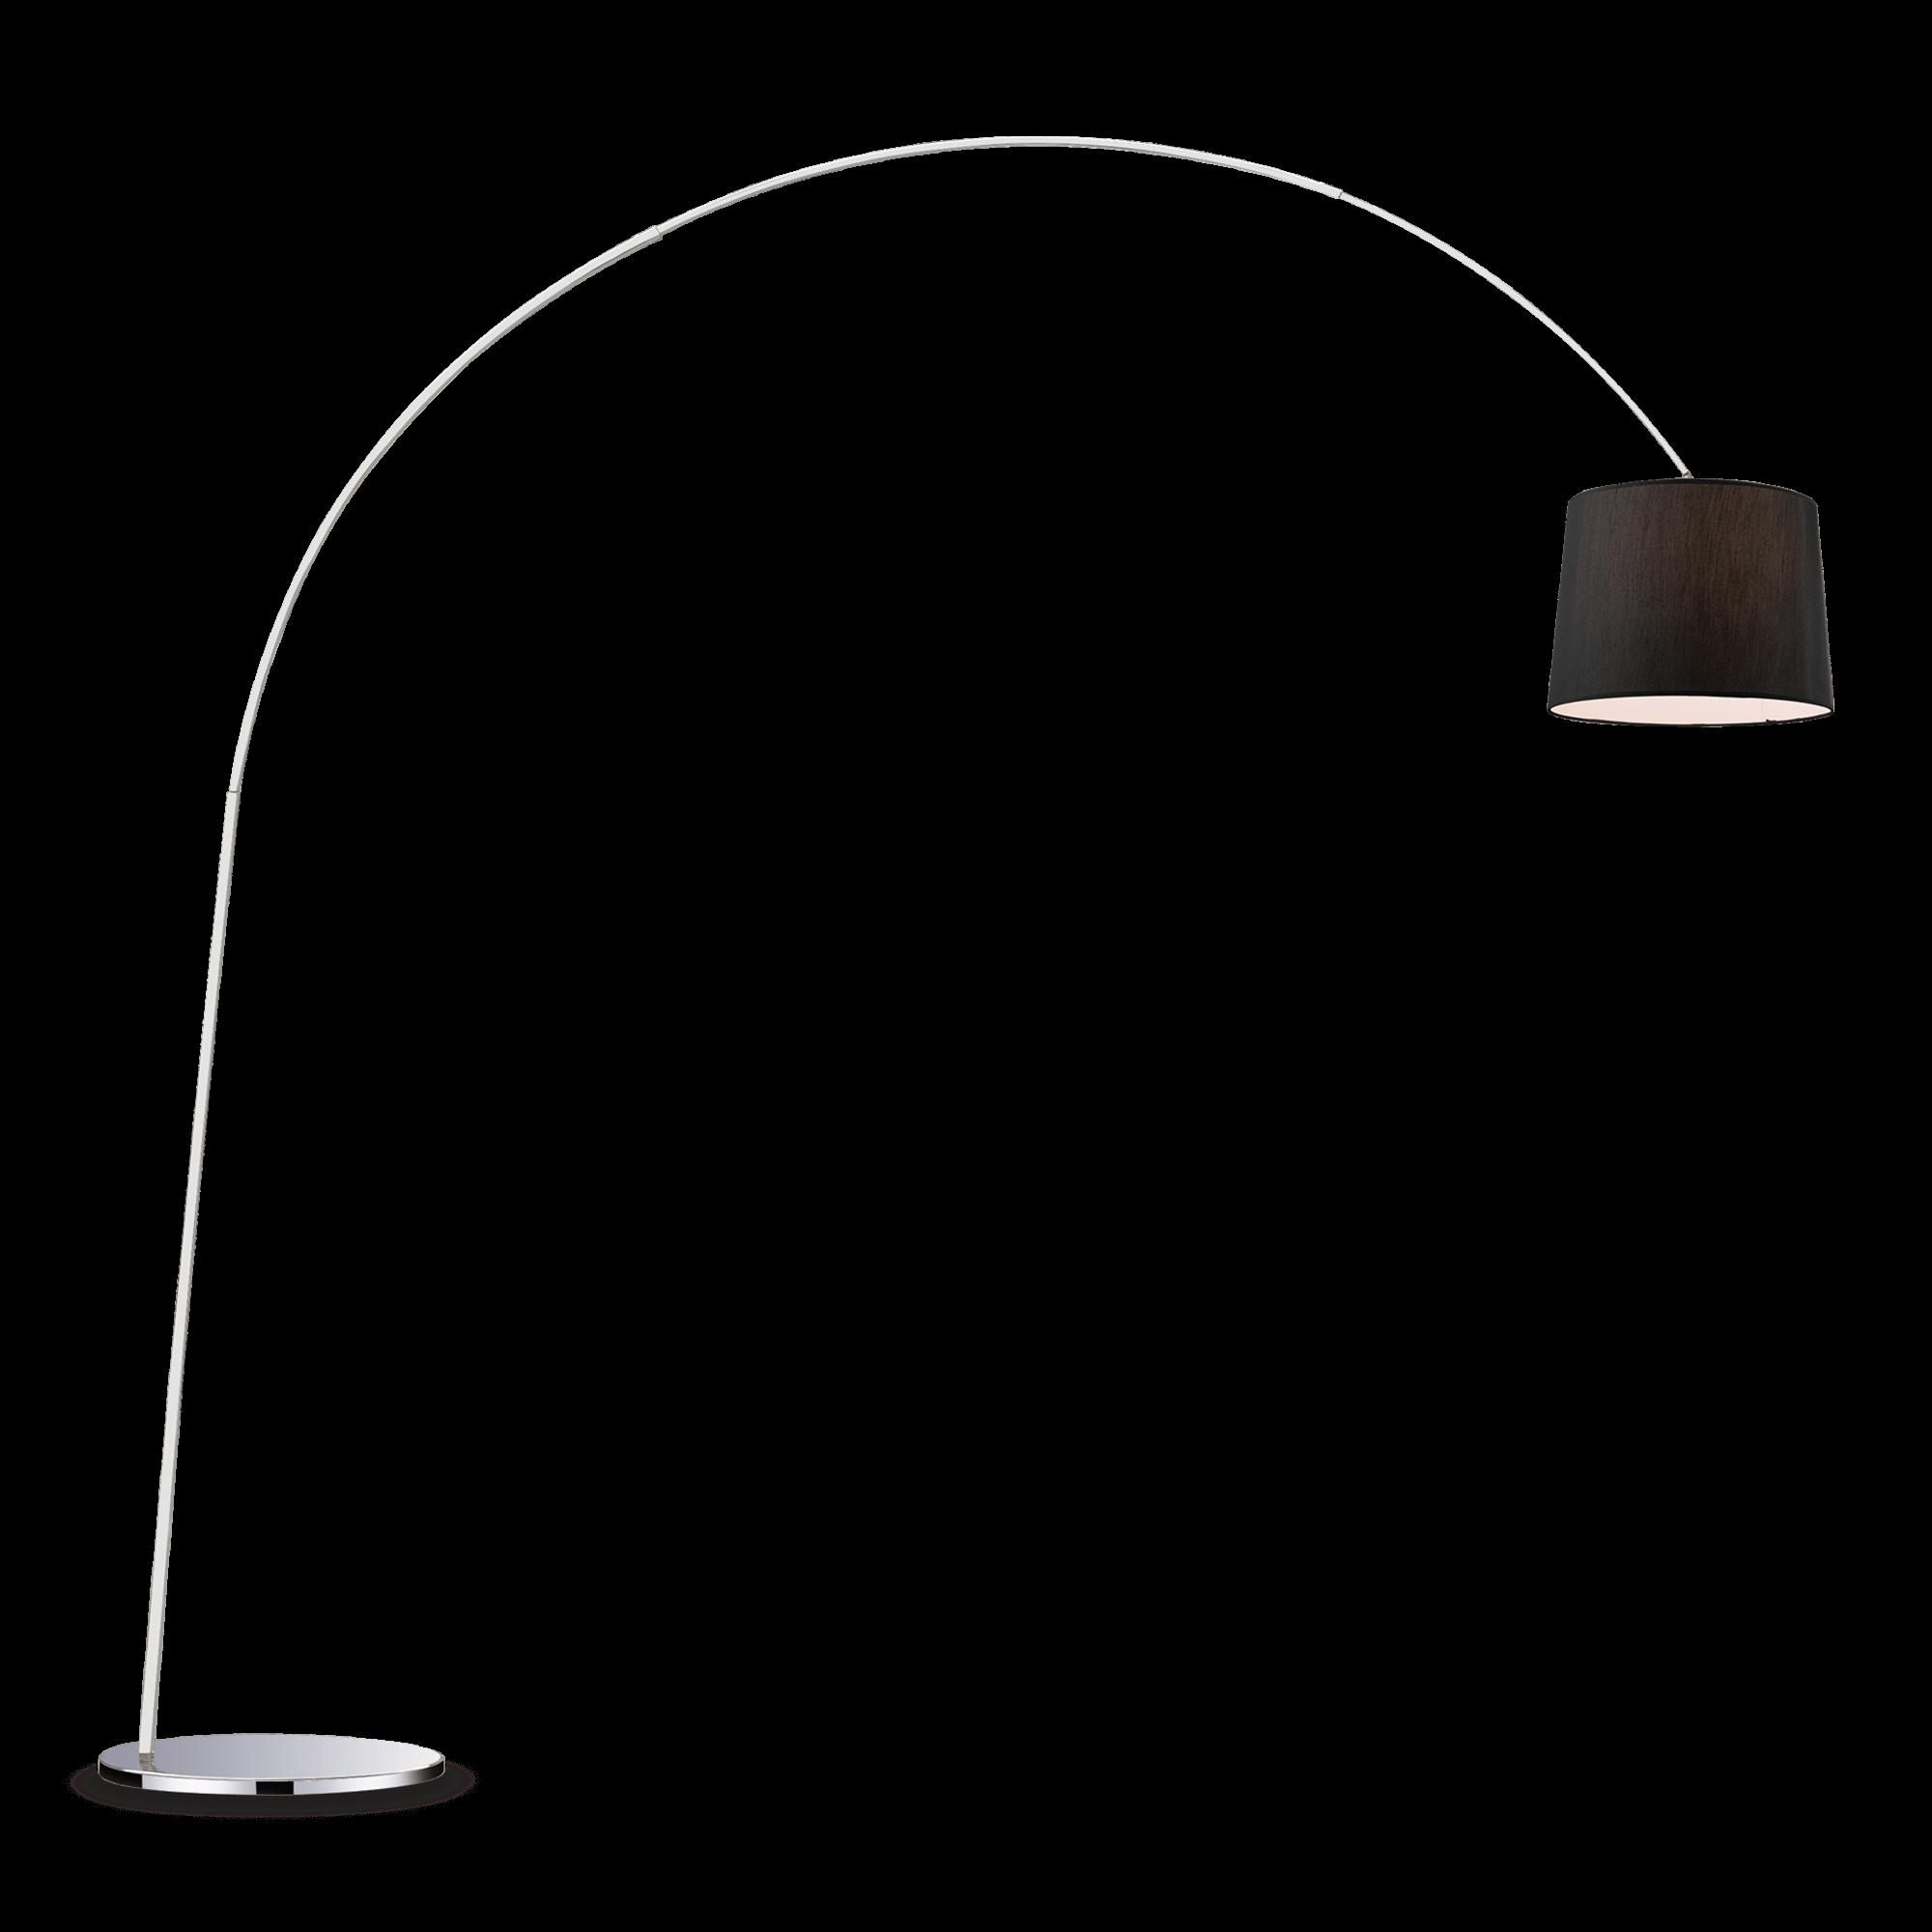 Ideal Lux 014371 Dorsale PT1 Nero állólámpa